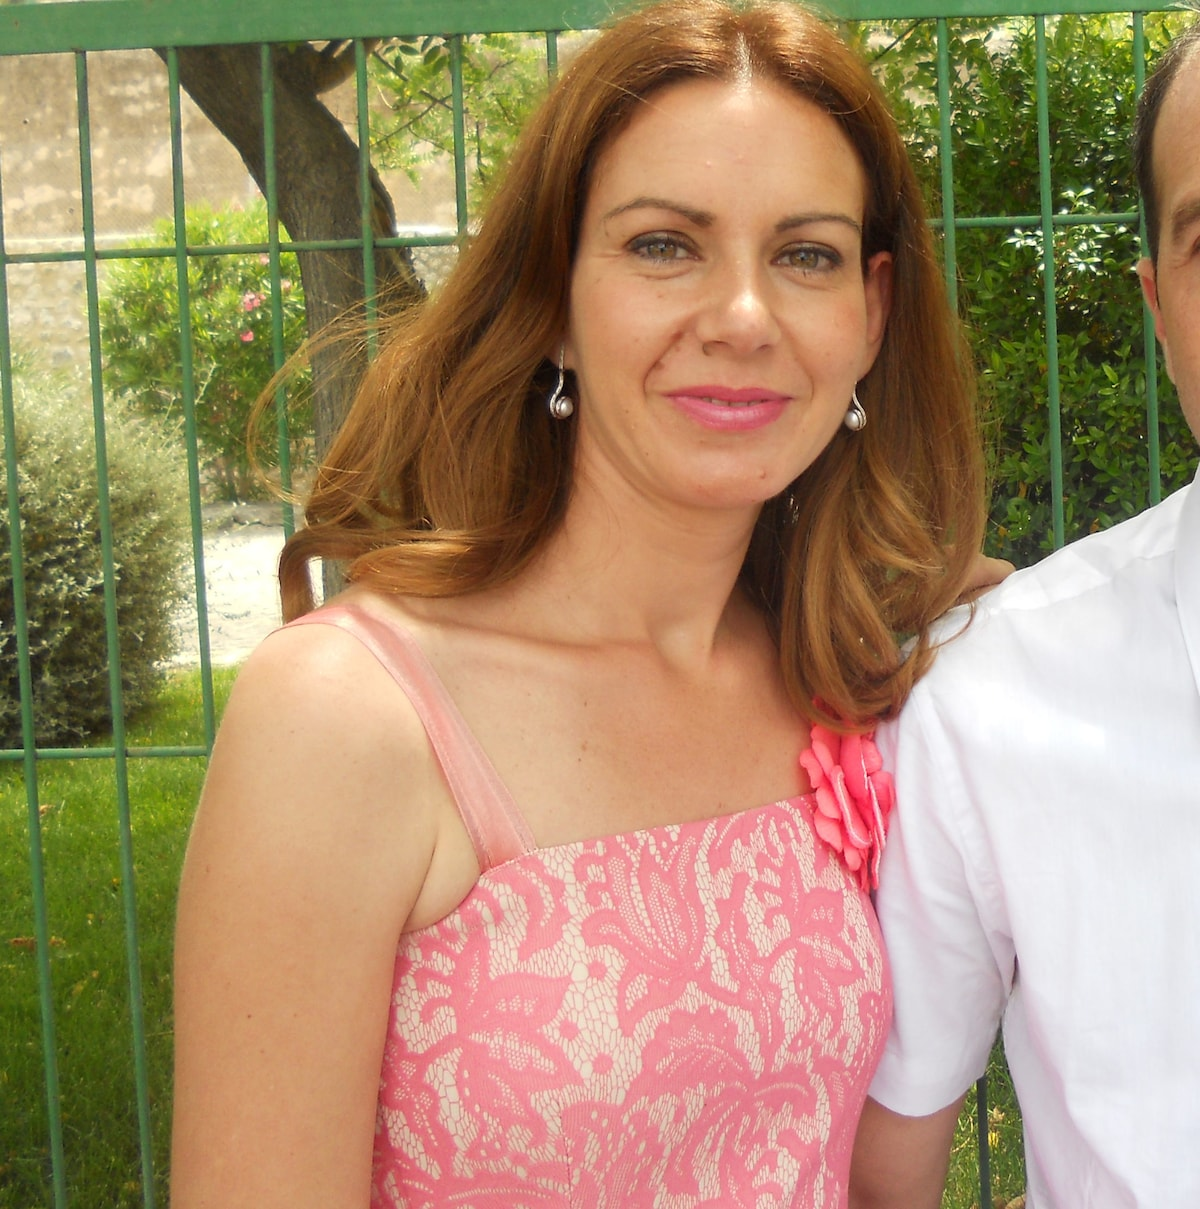 Maria from Benidorm